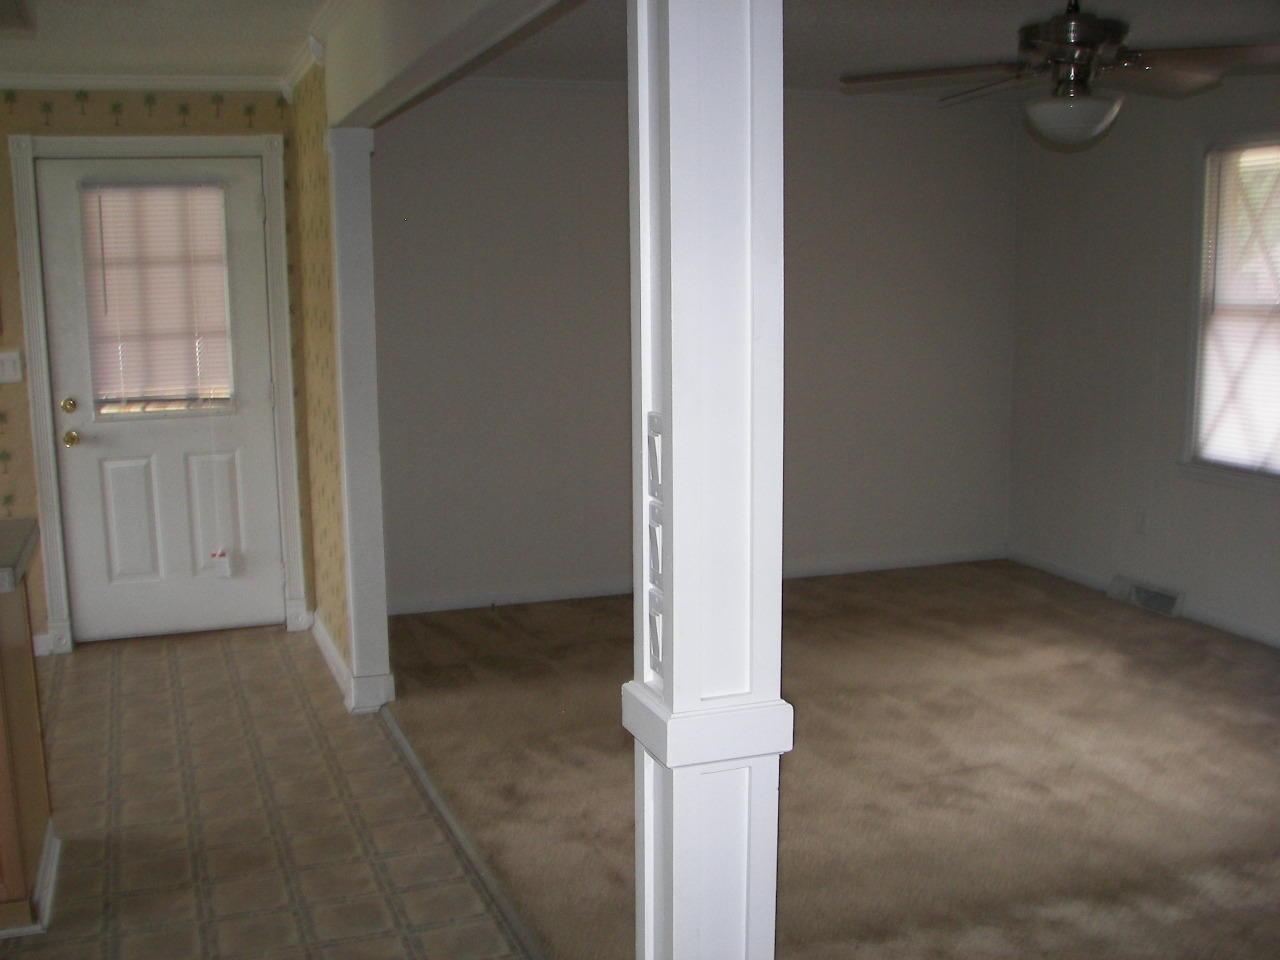 Glendale Acres Homes For Sale - 214 Ruby, Summerville, SC - 1